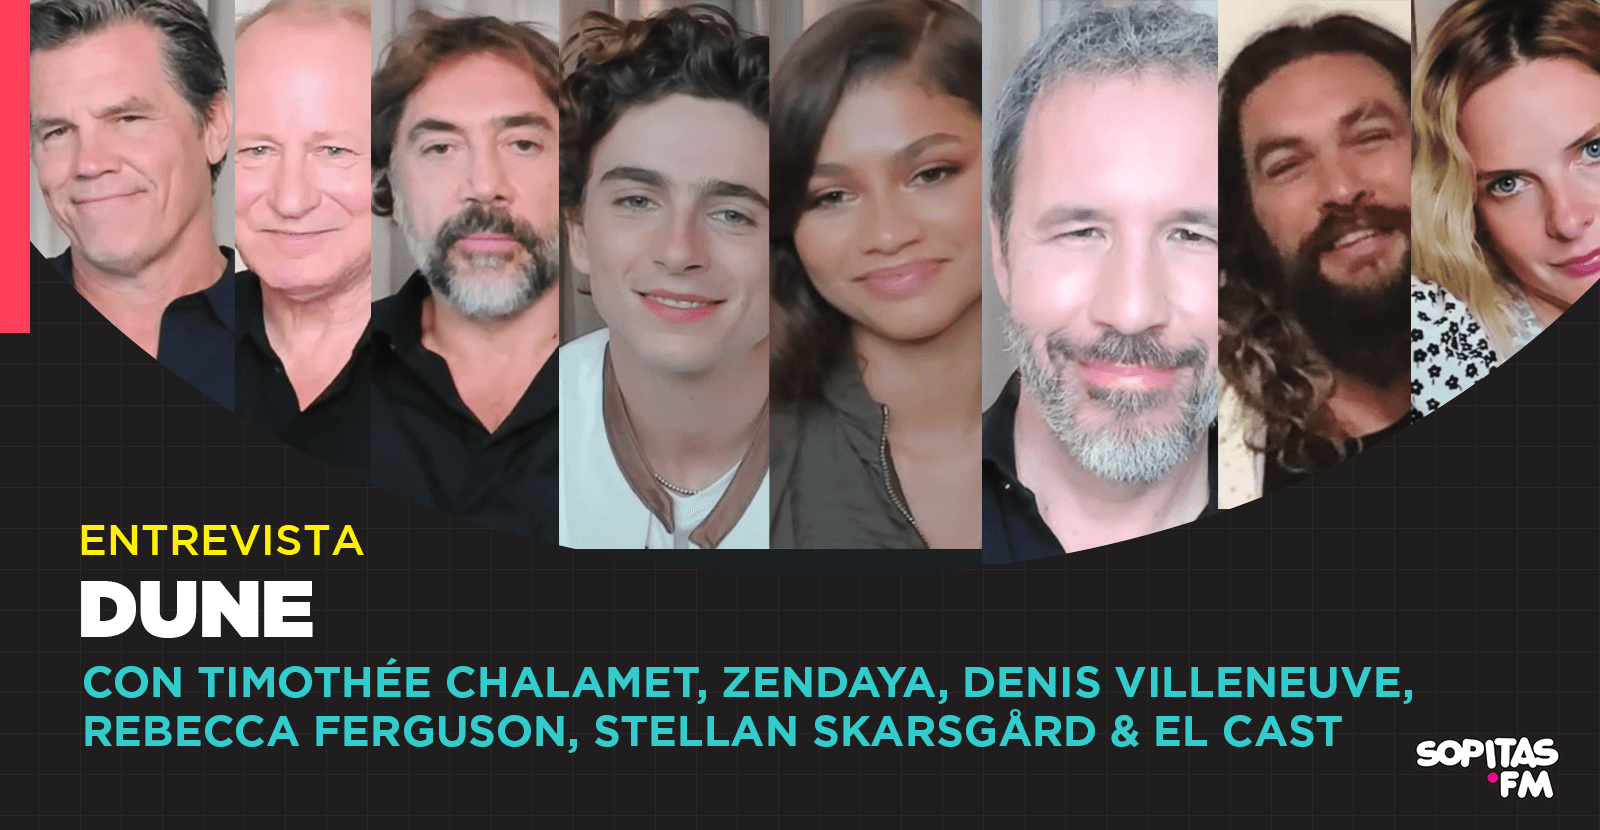 'Dune': Entrevista con Timothée Chalamet, Zendaya, Denis Villeneuve y el elenco